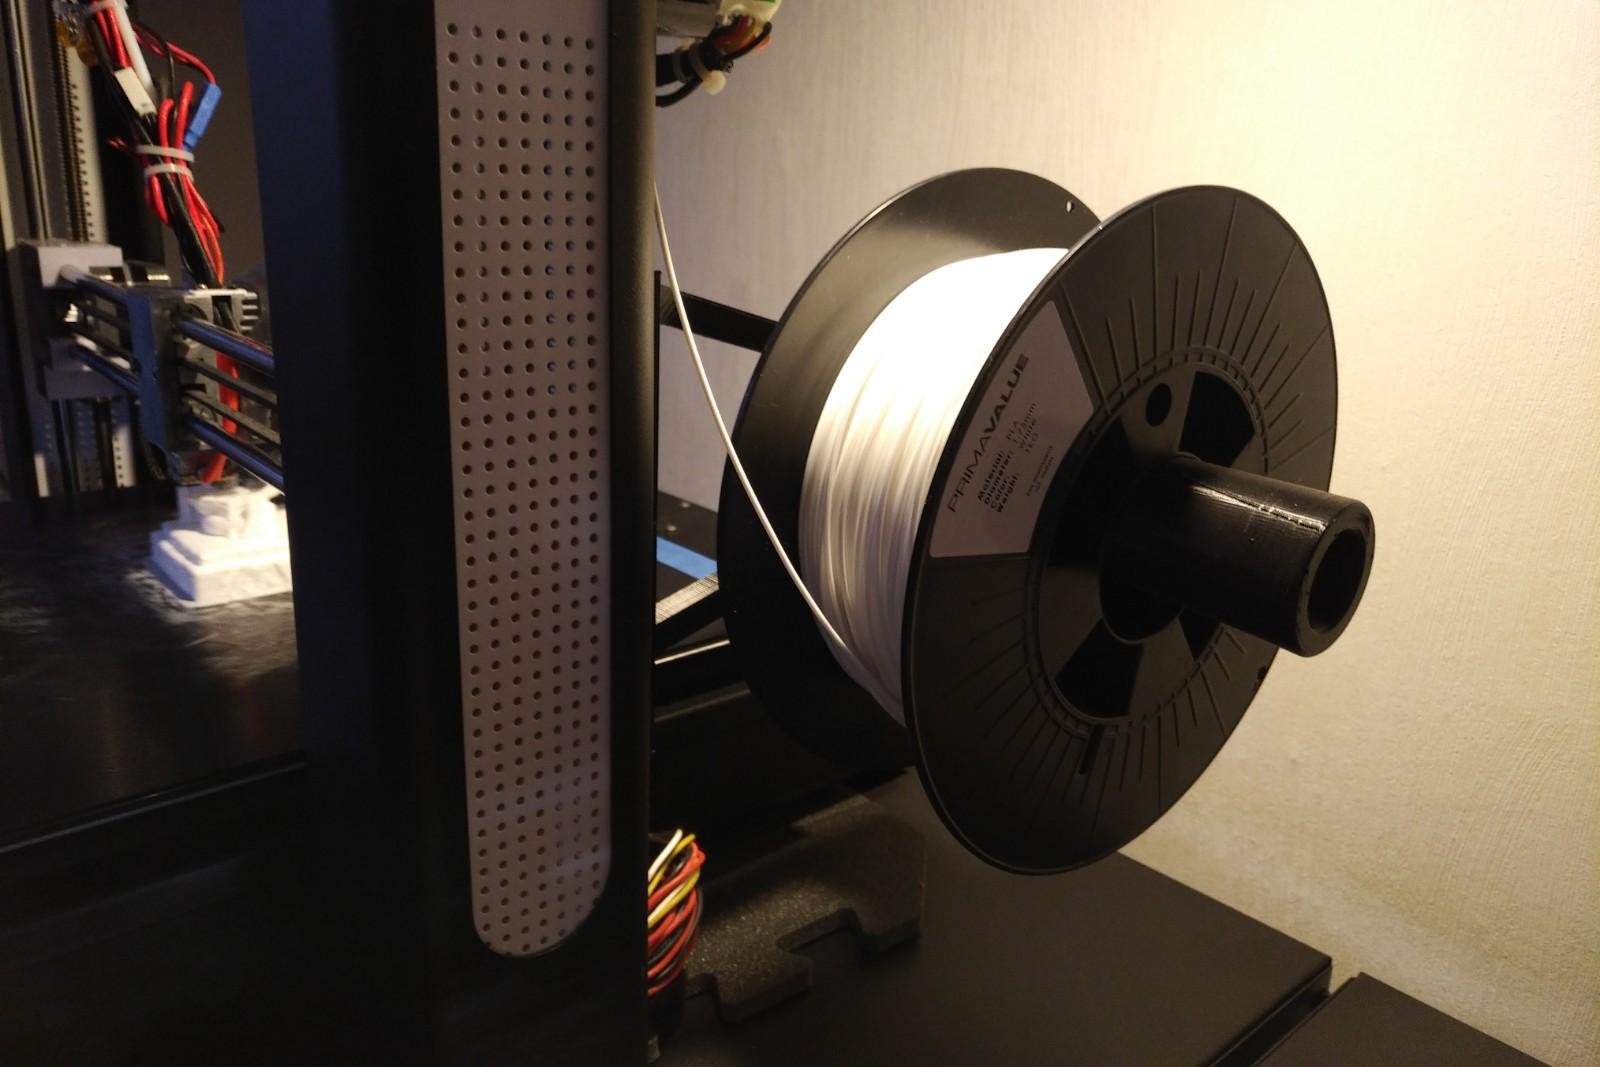 JG-spholder.jpg Télécharger fichier STL gratuit JGAurora spoolholder v2 (mis à jour) • Plan à imprimer en 3D, TimBauer-TB3Dprint